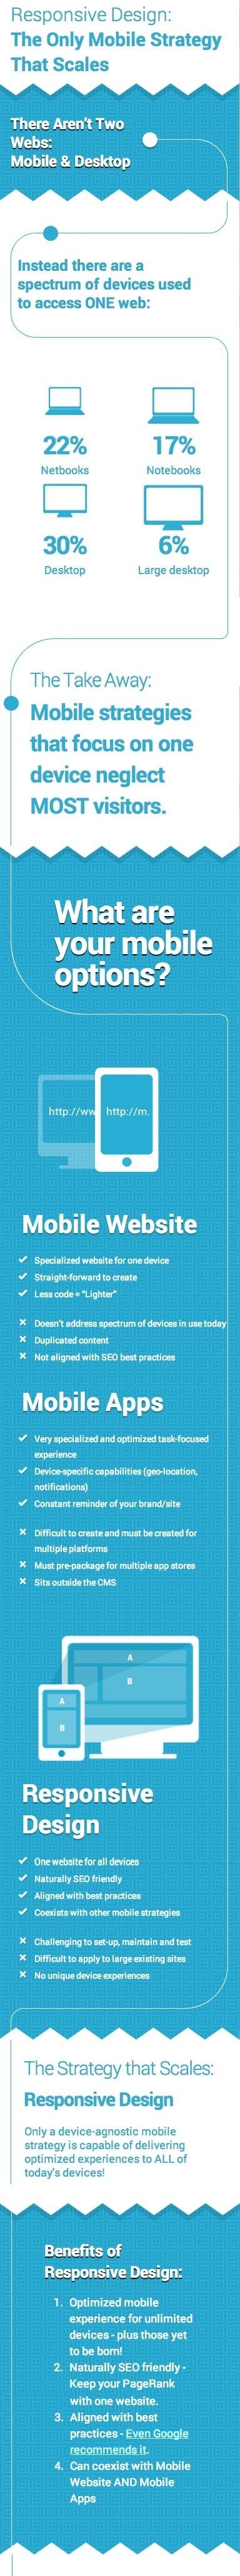 A Responsive Infographic on Responsive Design #responsivedesign #websitedesign | tech of the week | Scoop.it